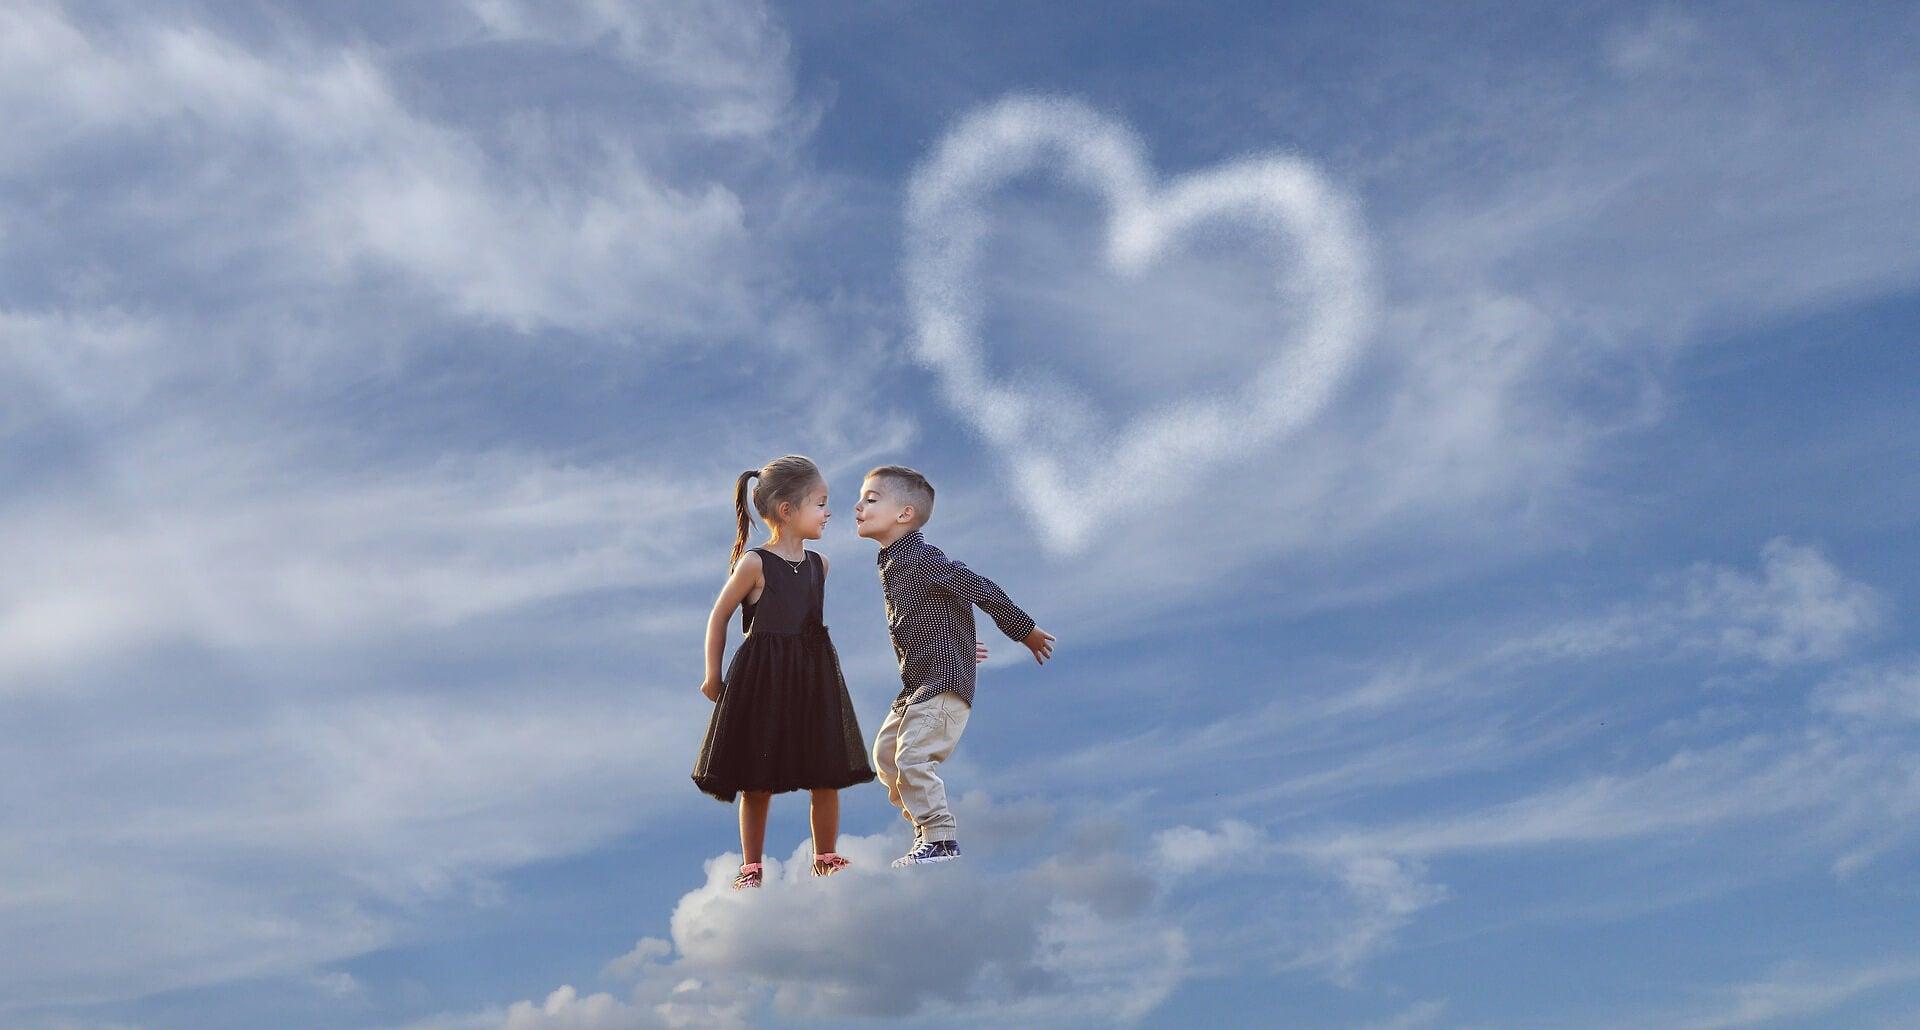 menino beijando menina flutuando nas nuvens